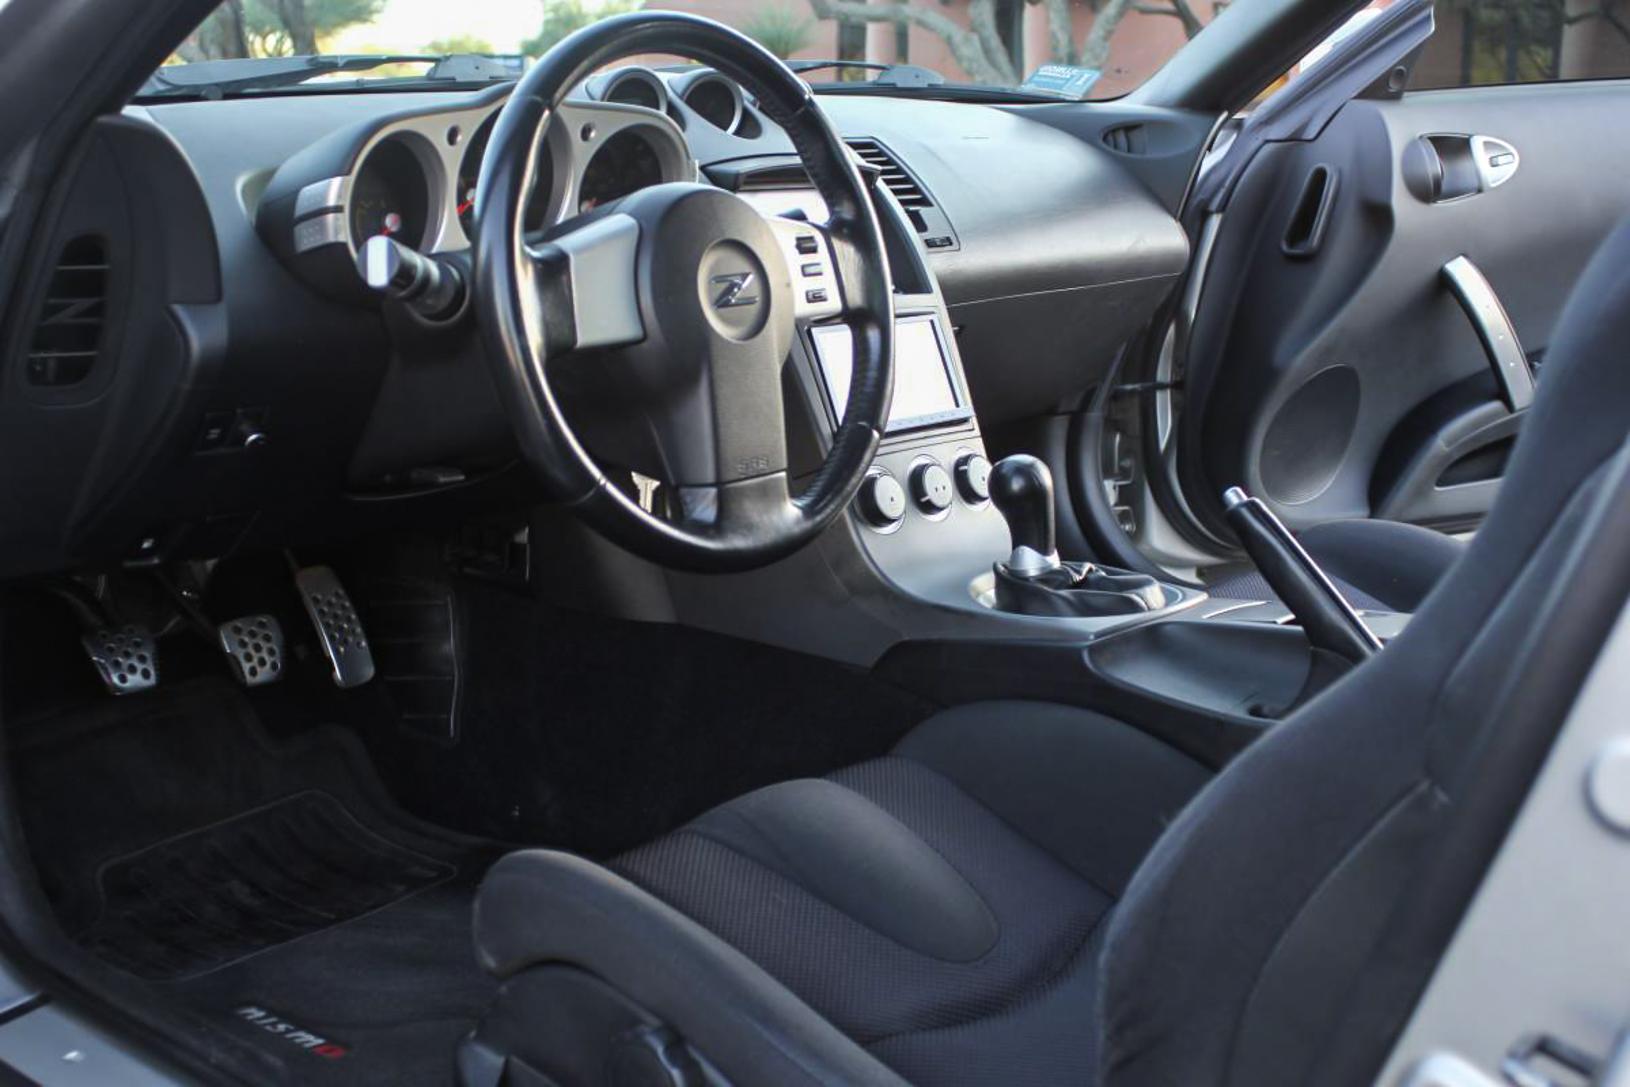 2003 Nissan 350Z 'Track'